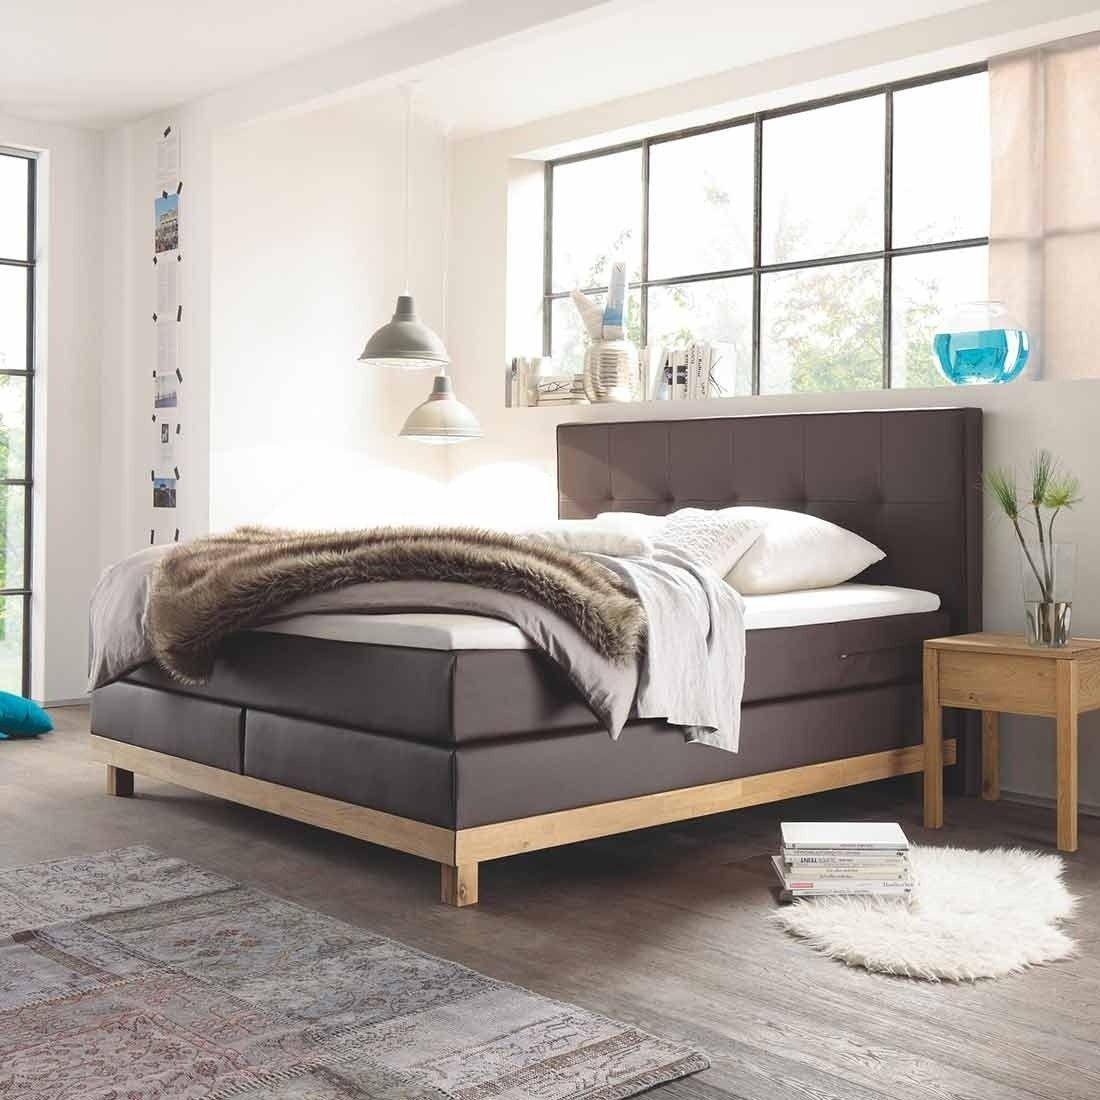 hasena pronto bella boxspringbett massivholz eiche bianco 160x200 cm polster kunstleder braun. Black Bedroom Furniture Sets. Home Design Ideas